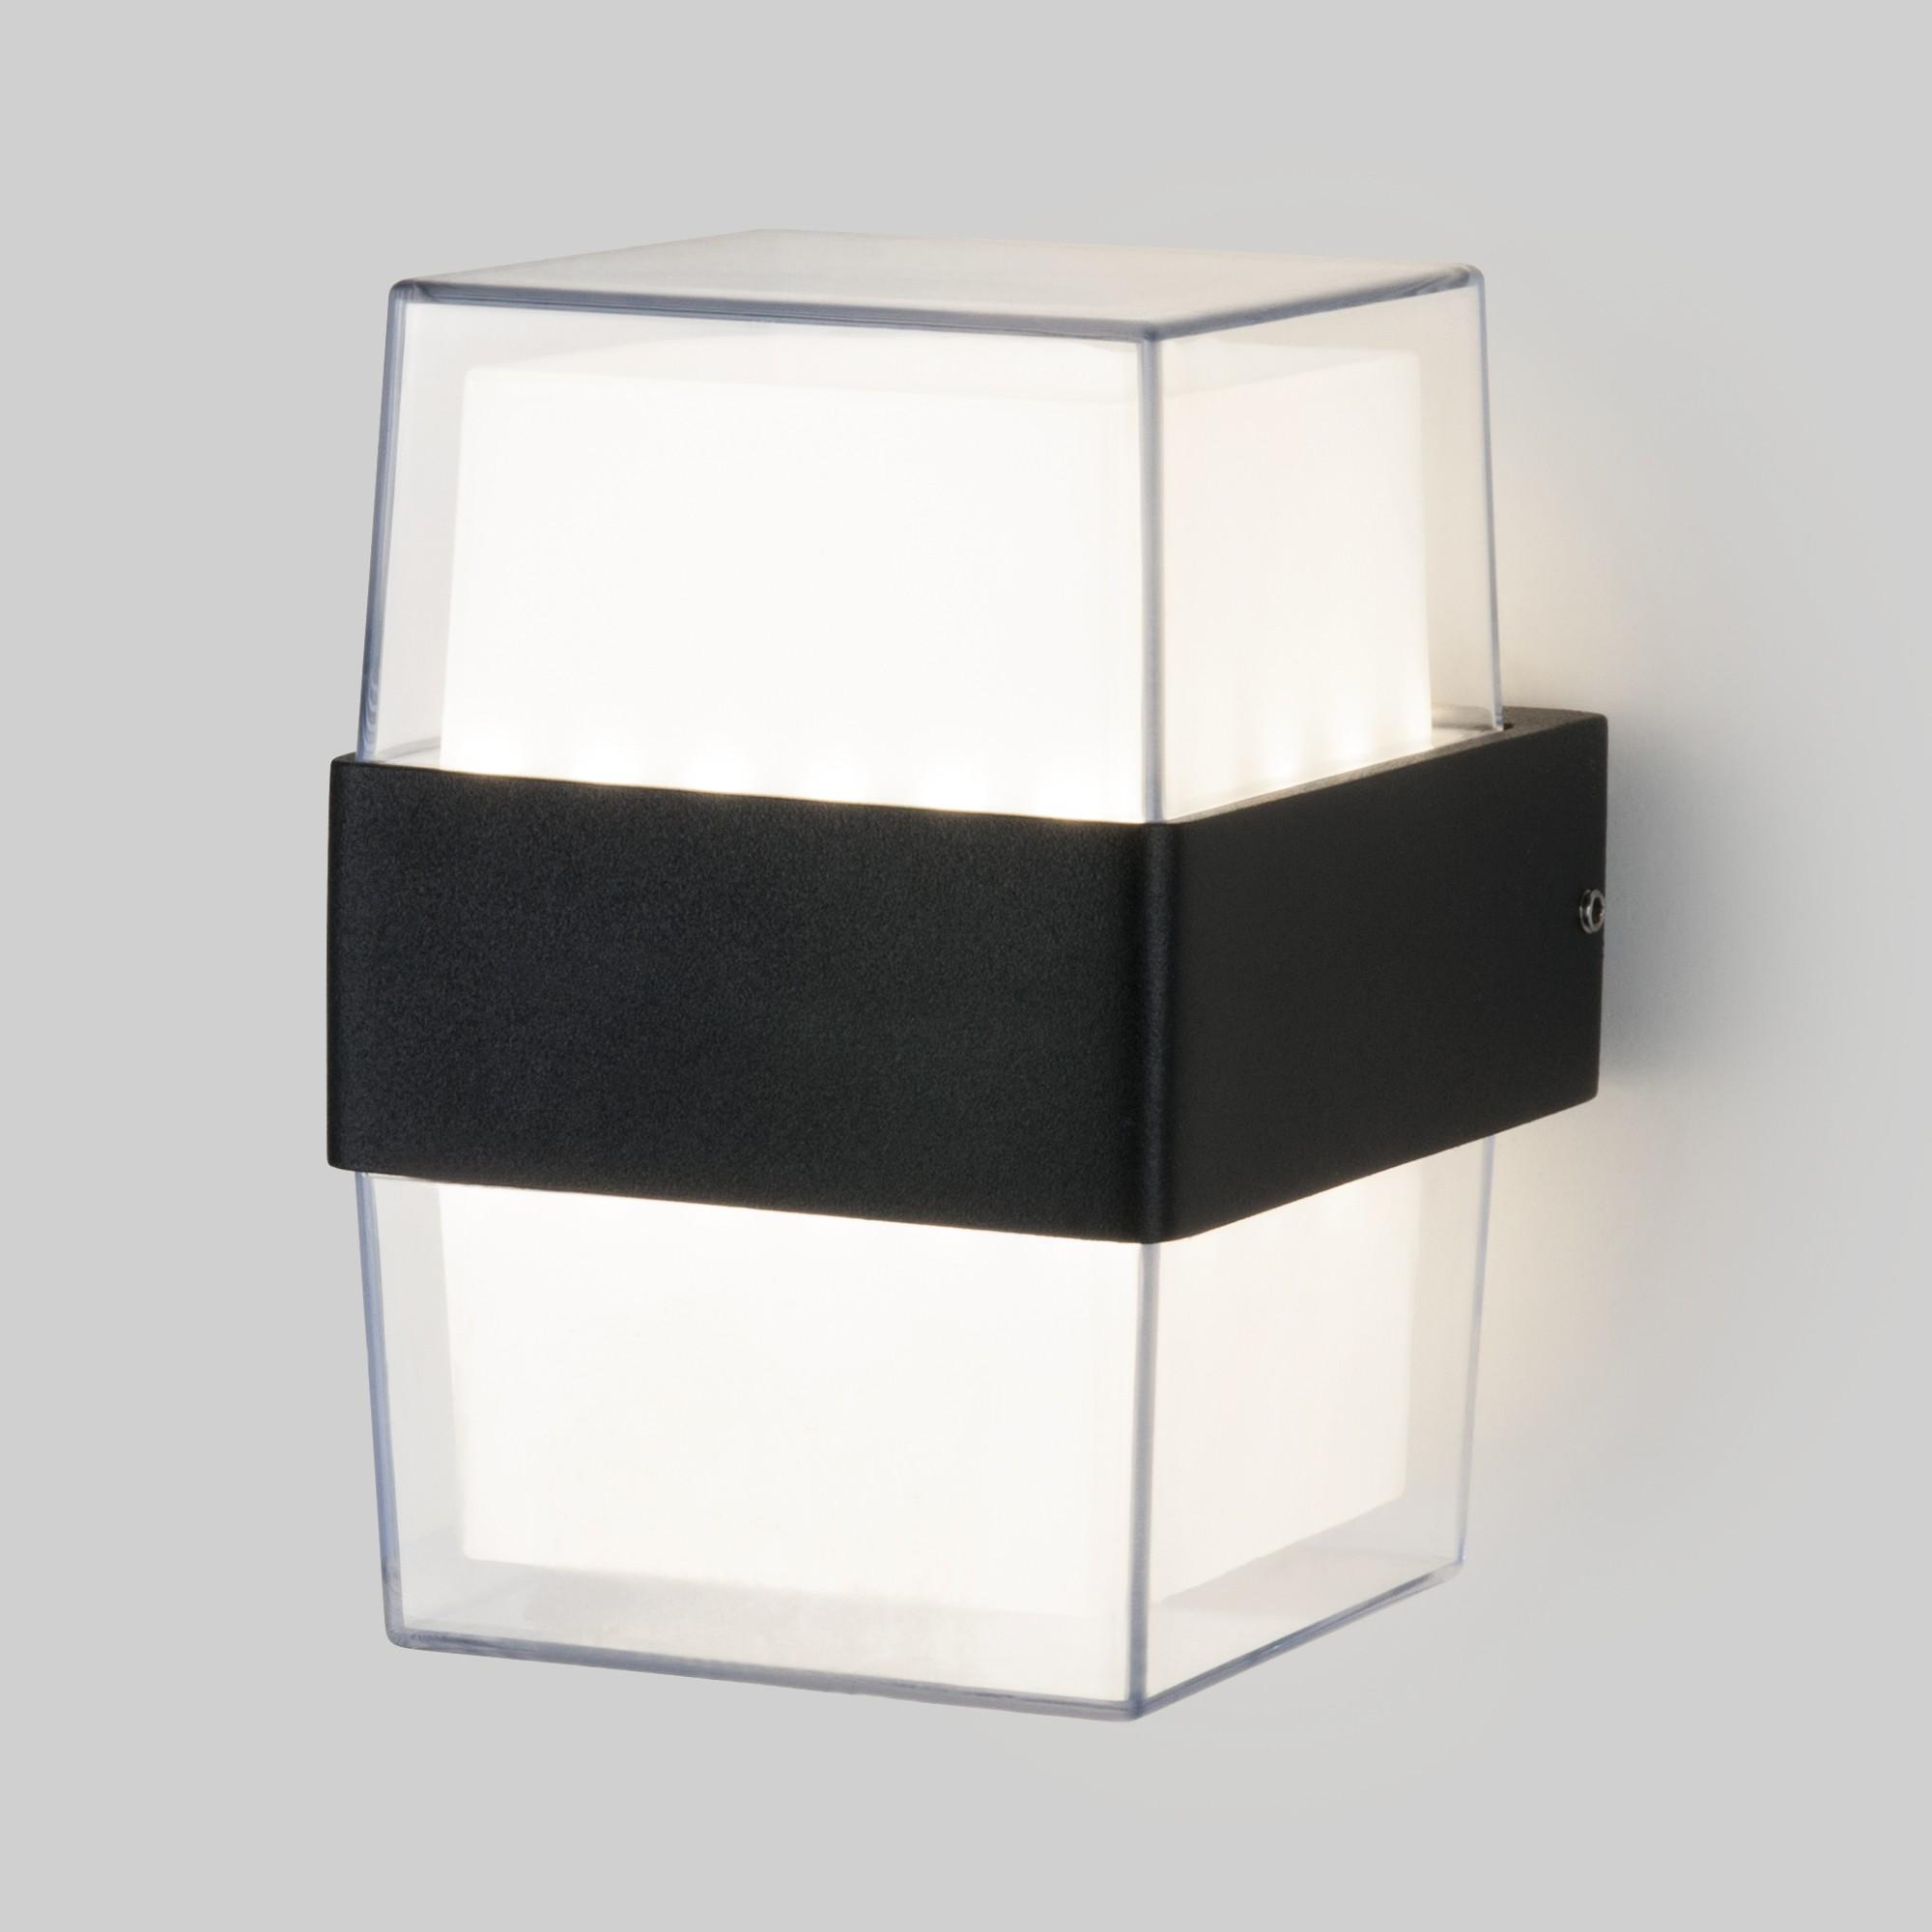 1519 TECHNO LED Maul чёрный